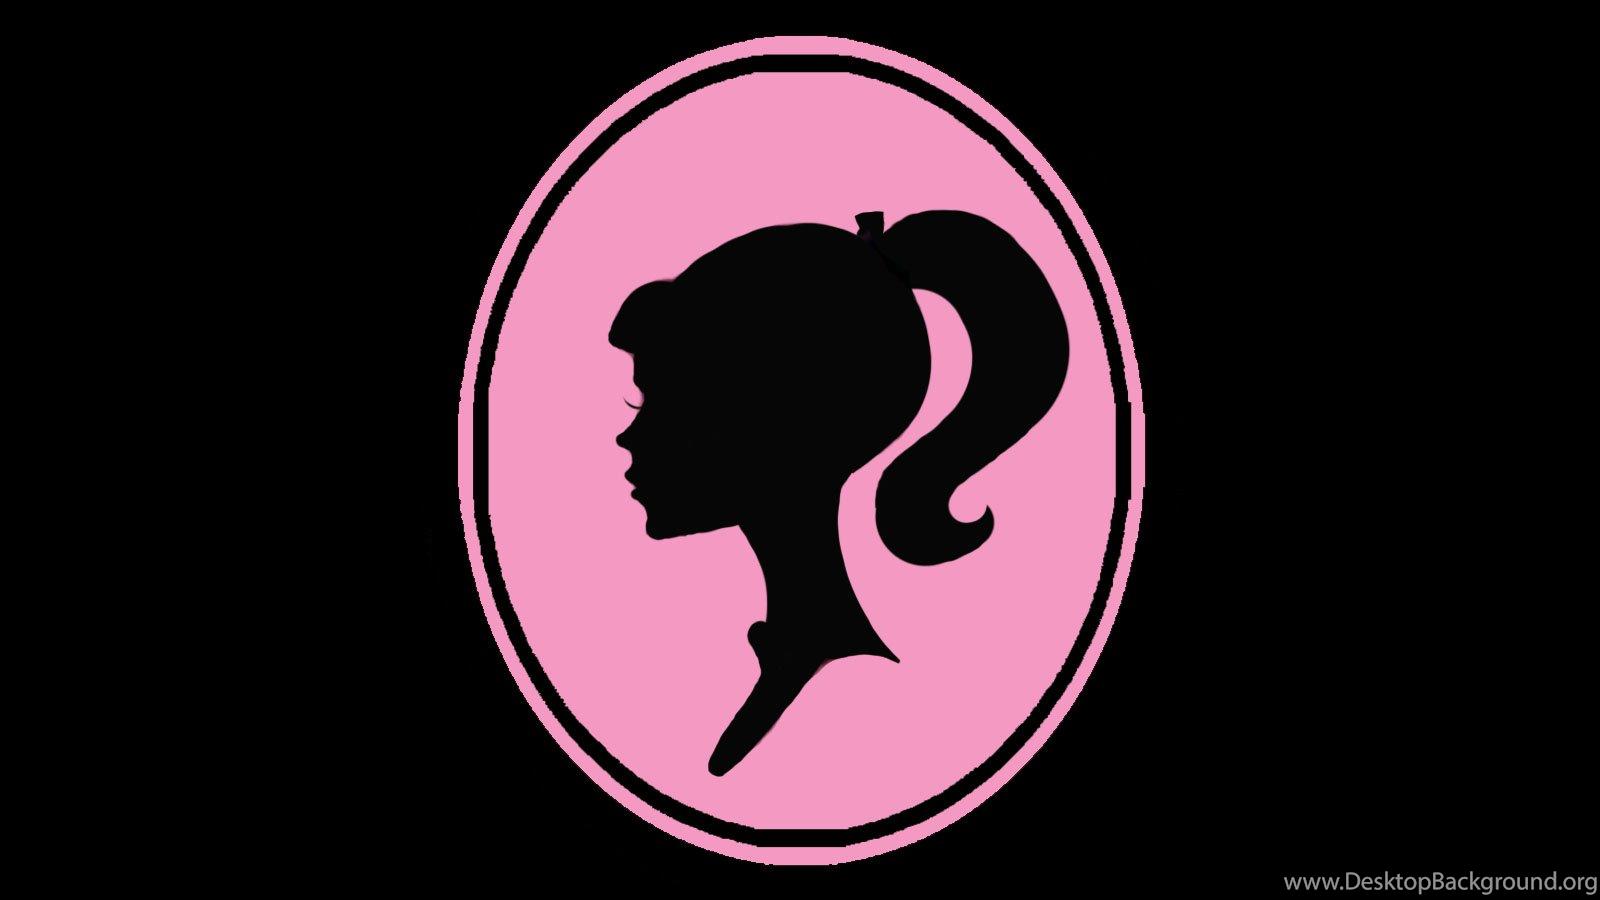 Download 6000 Koleksi Background Tumblr Black And Pink HD Terbaru